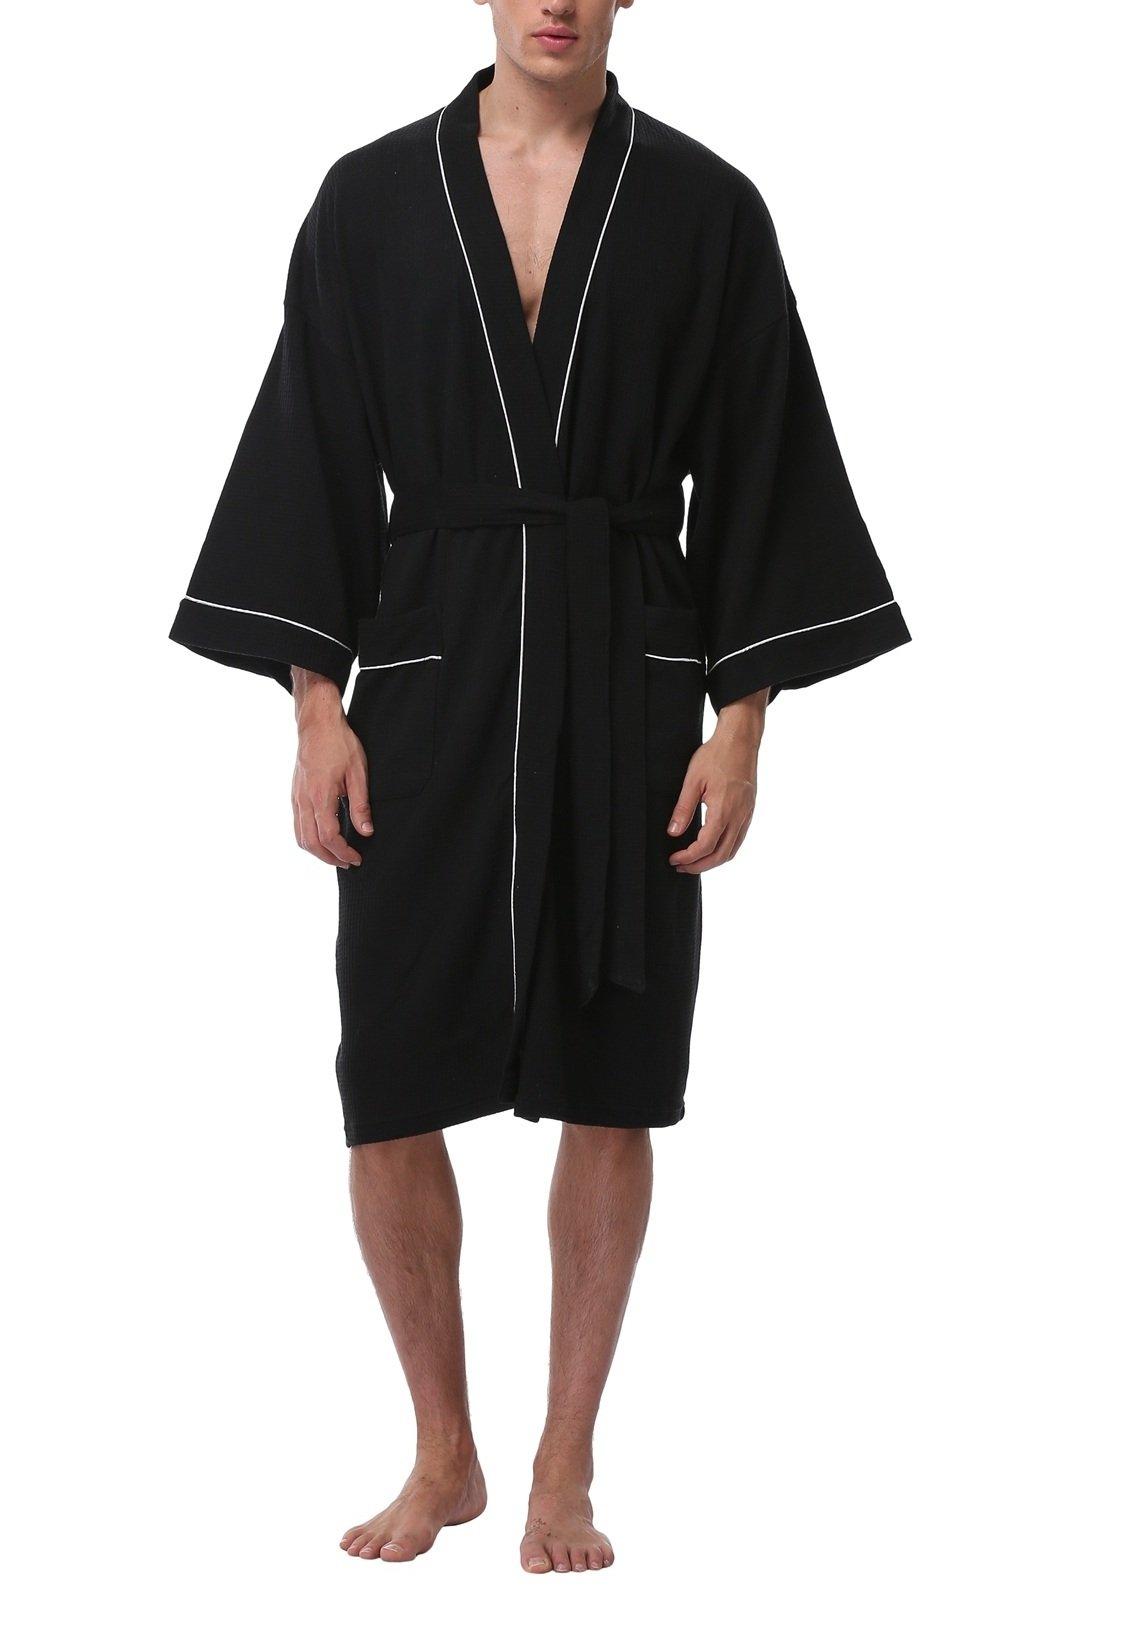 Men's Lightweight Cotton Bathrobe,Black,XL